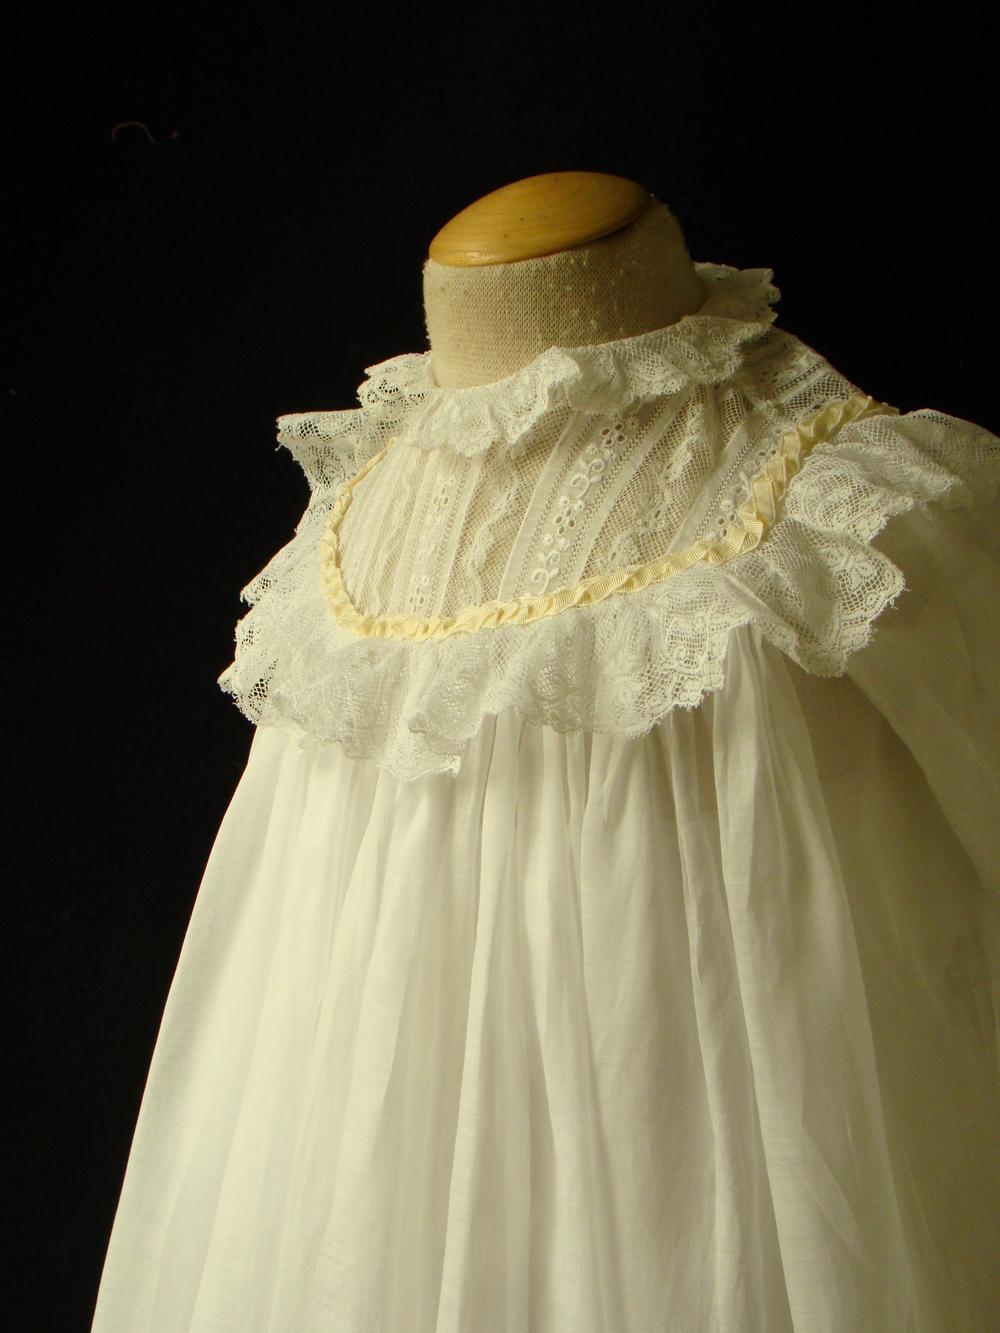 gowns3 026.JPG